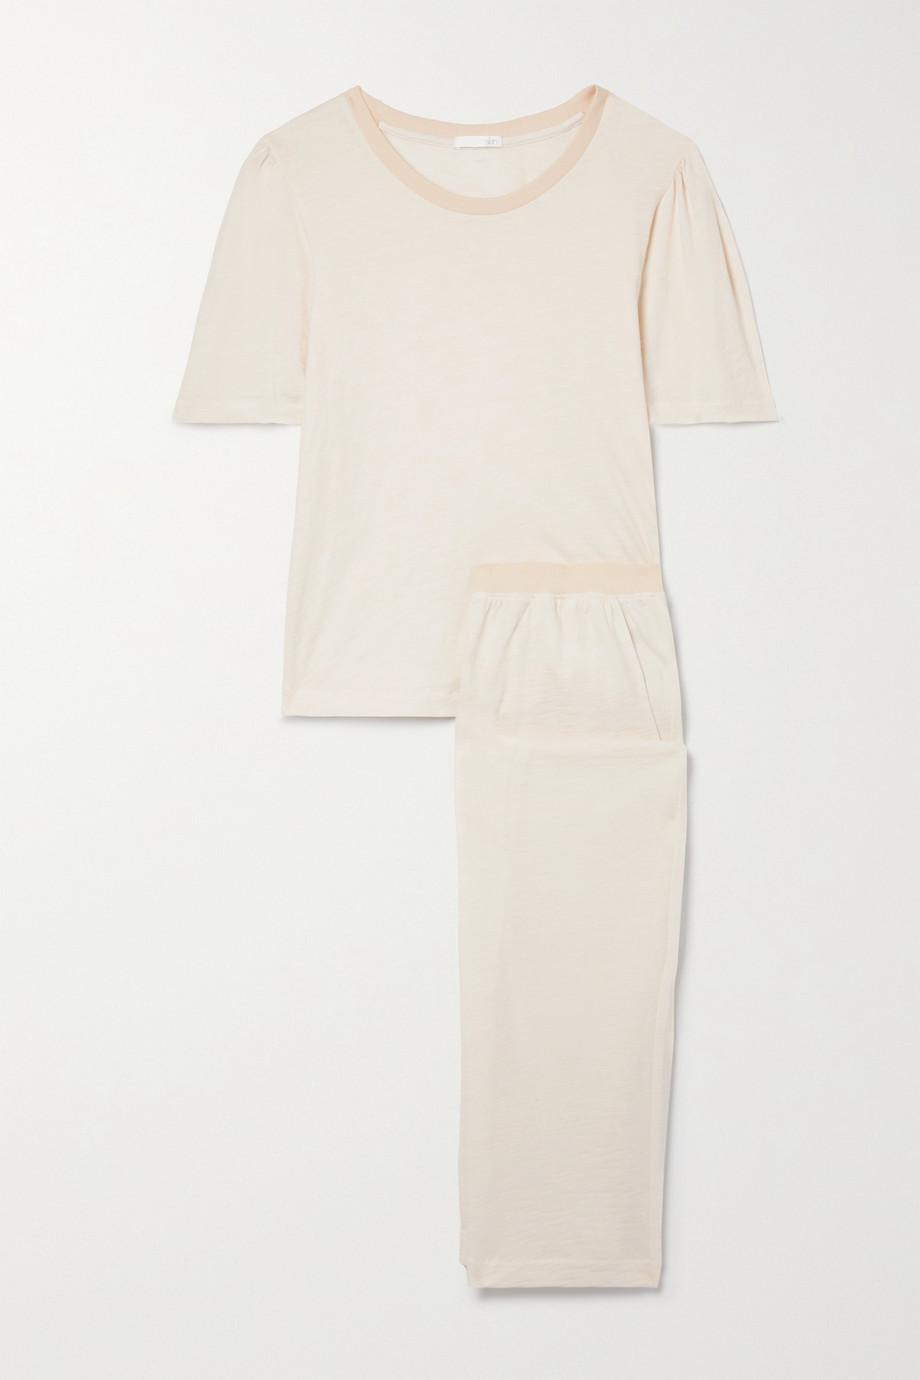 Skin + NET SUSTAIN Frances Fabienne Pyjama aus Biobaumwoll-Jersey